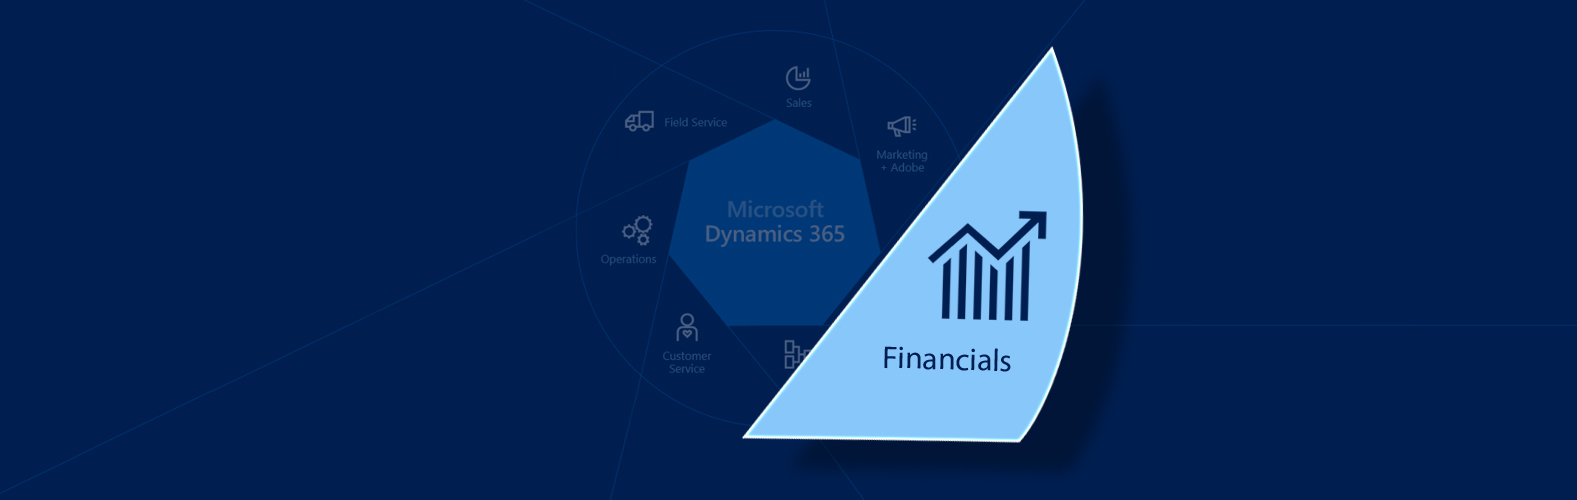 Dynamics 365 For Financials et Dynamics NAV 2017